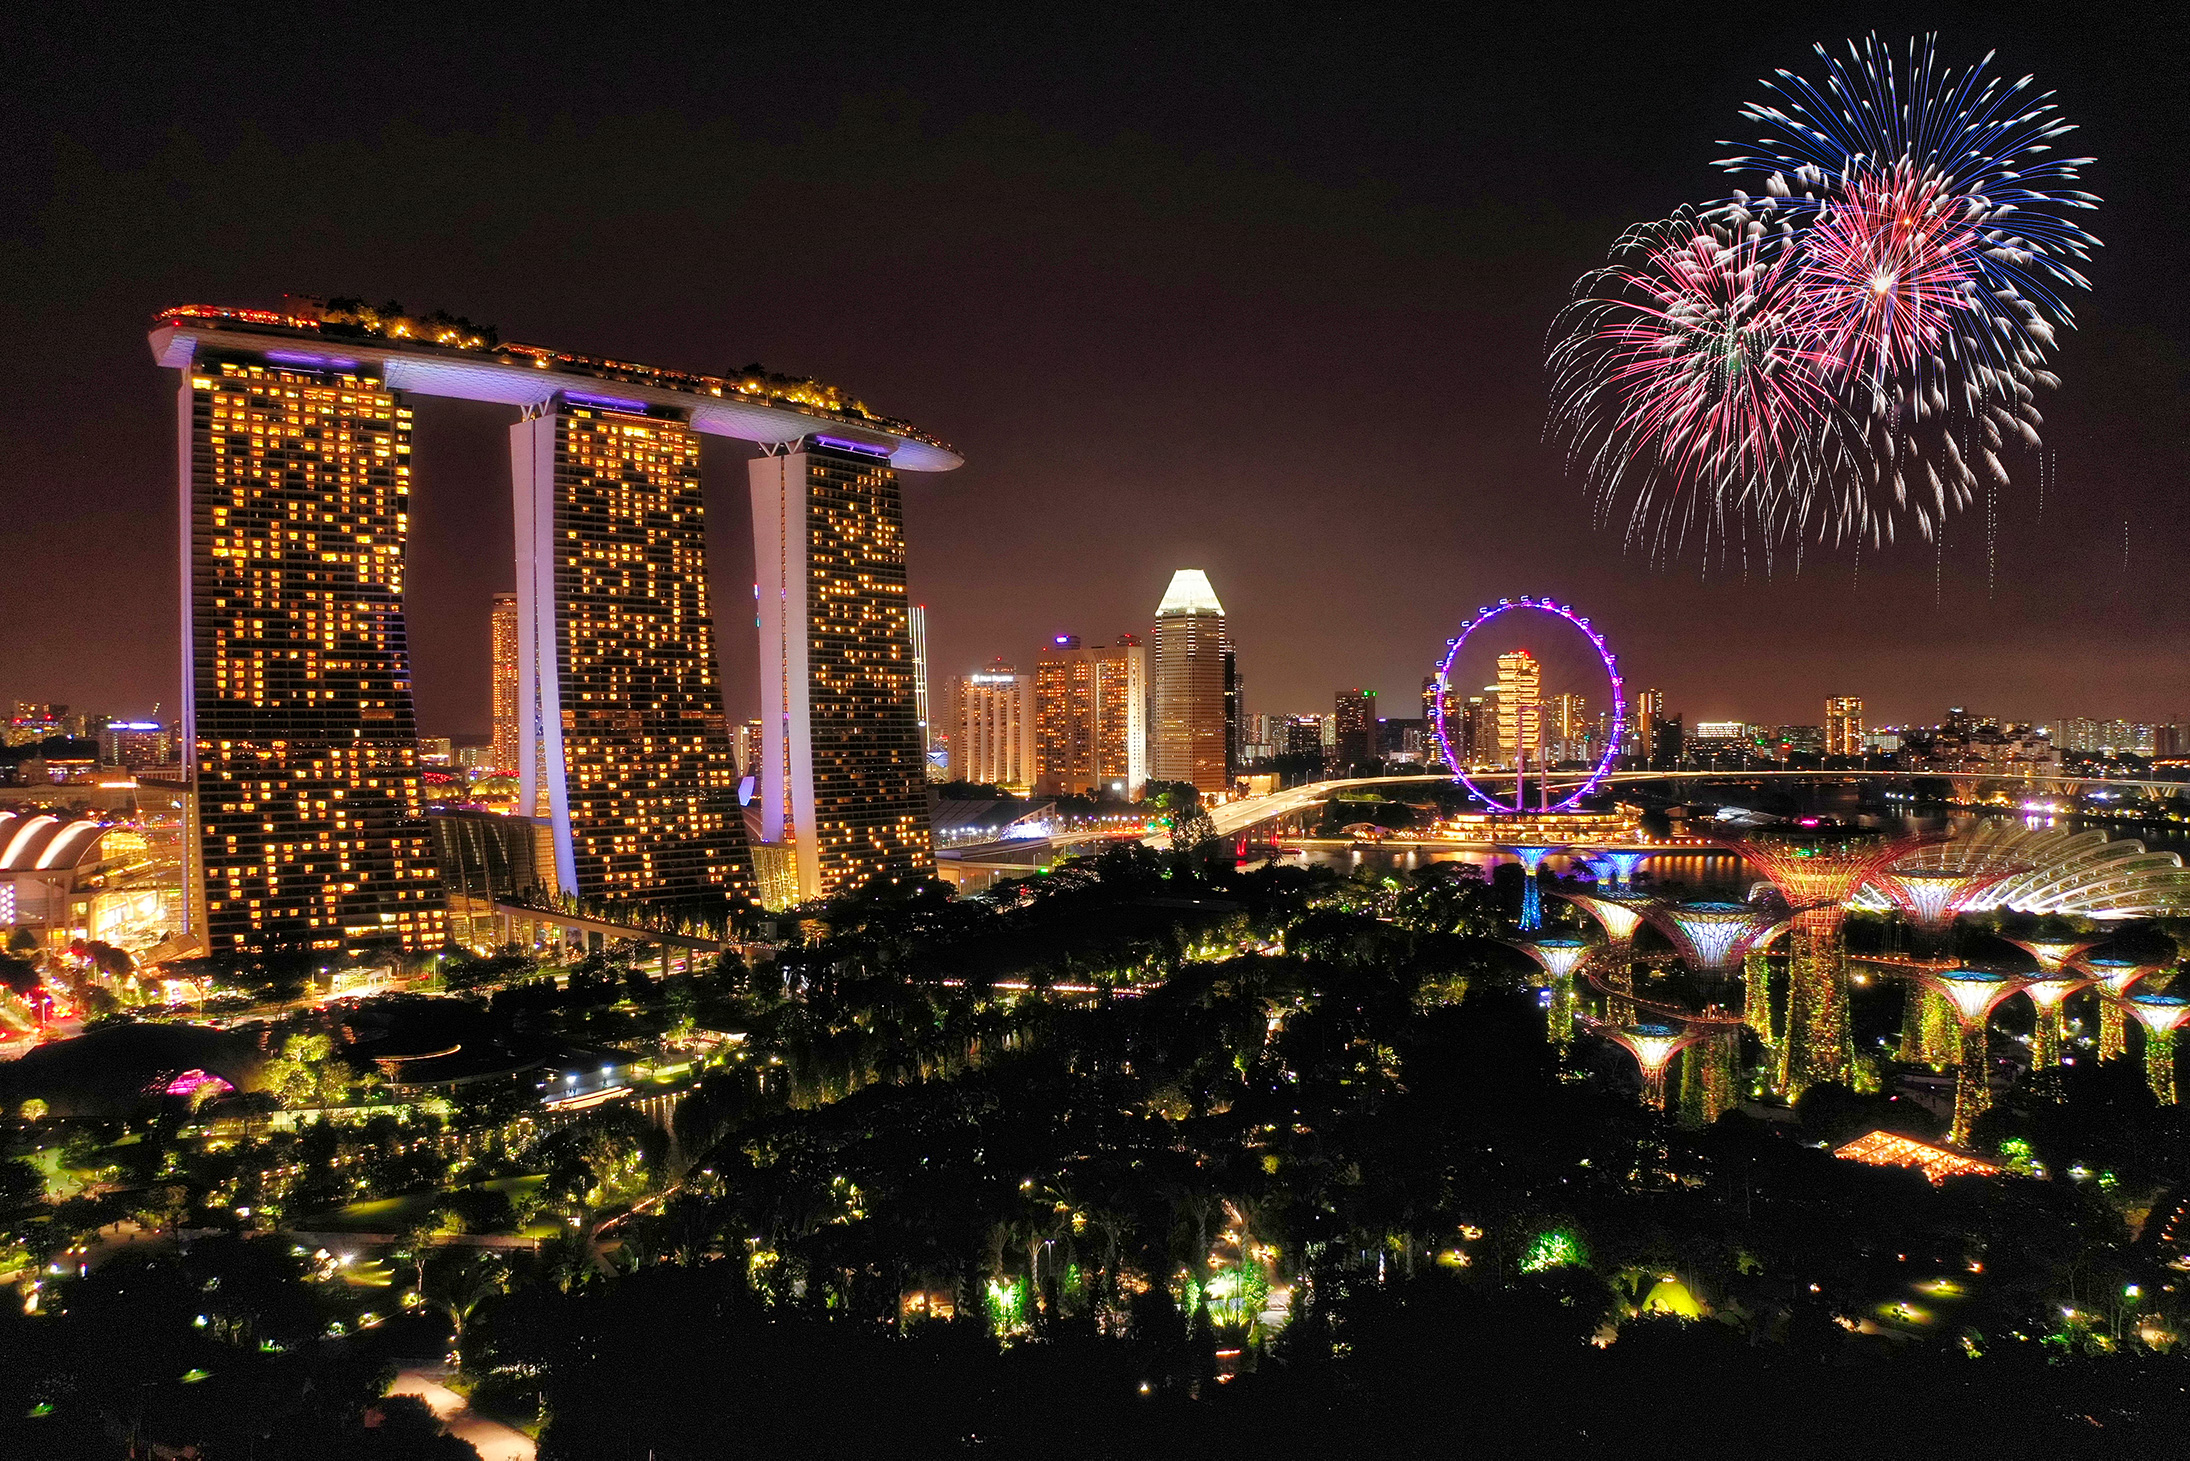 Singapore_at_night2.jpg